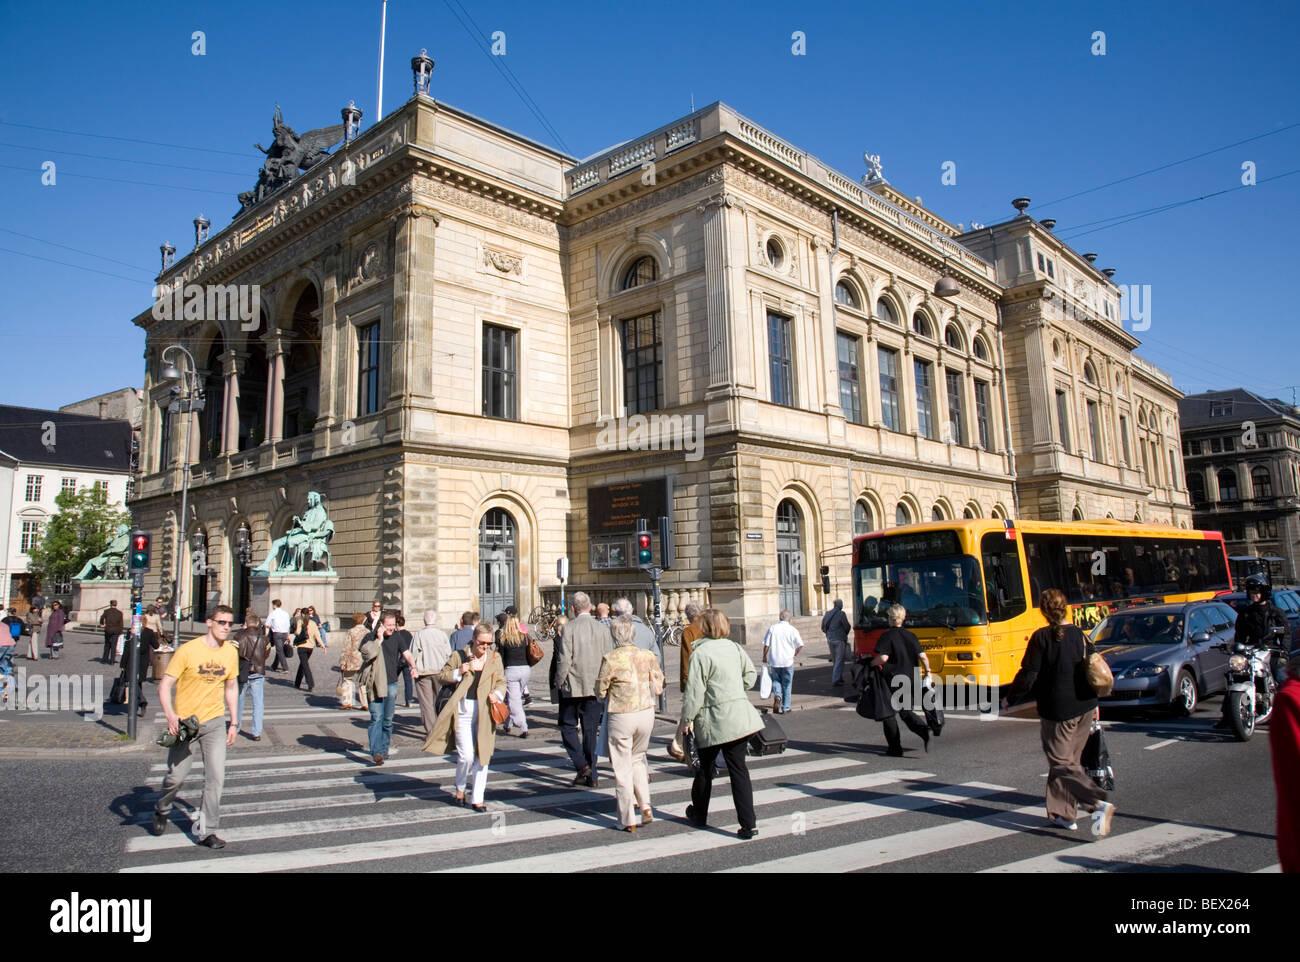 The Royal Danish Theatre at Kongens Nytorv, Copenhagen - Stock Image